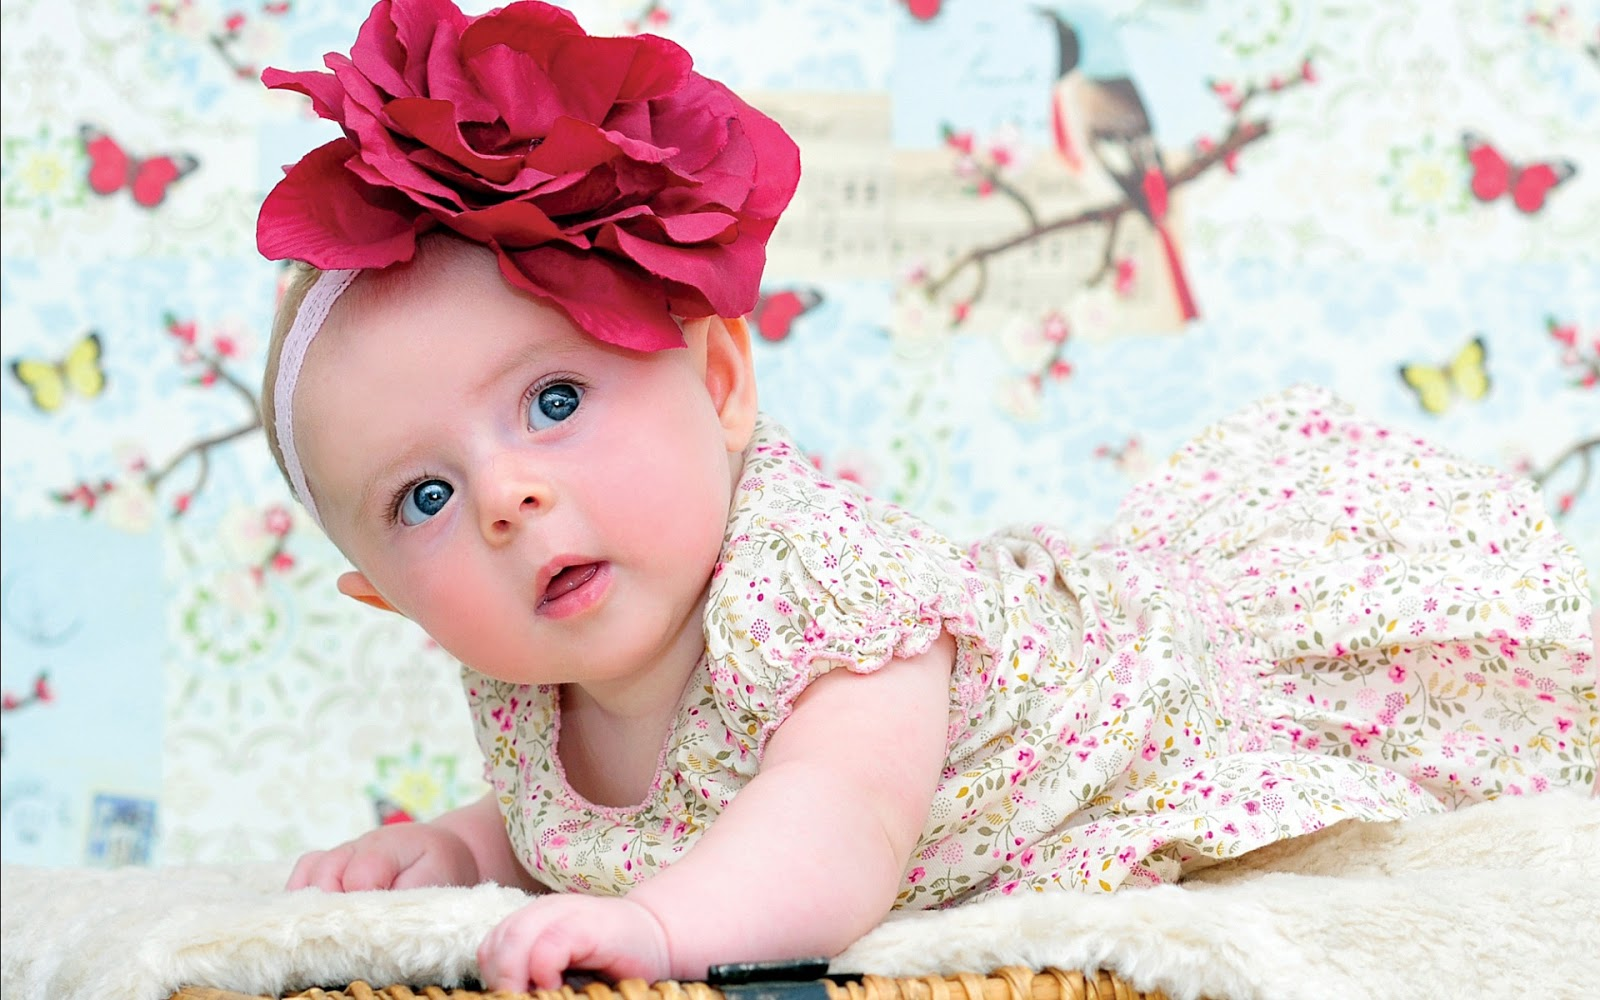 Free download baby clipart cute baby desktop - ClipartFox